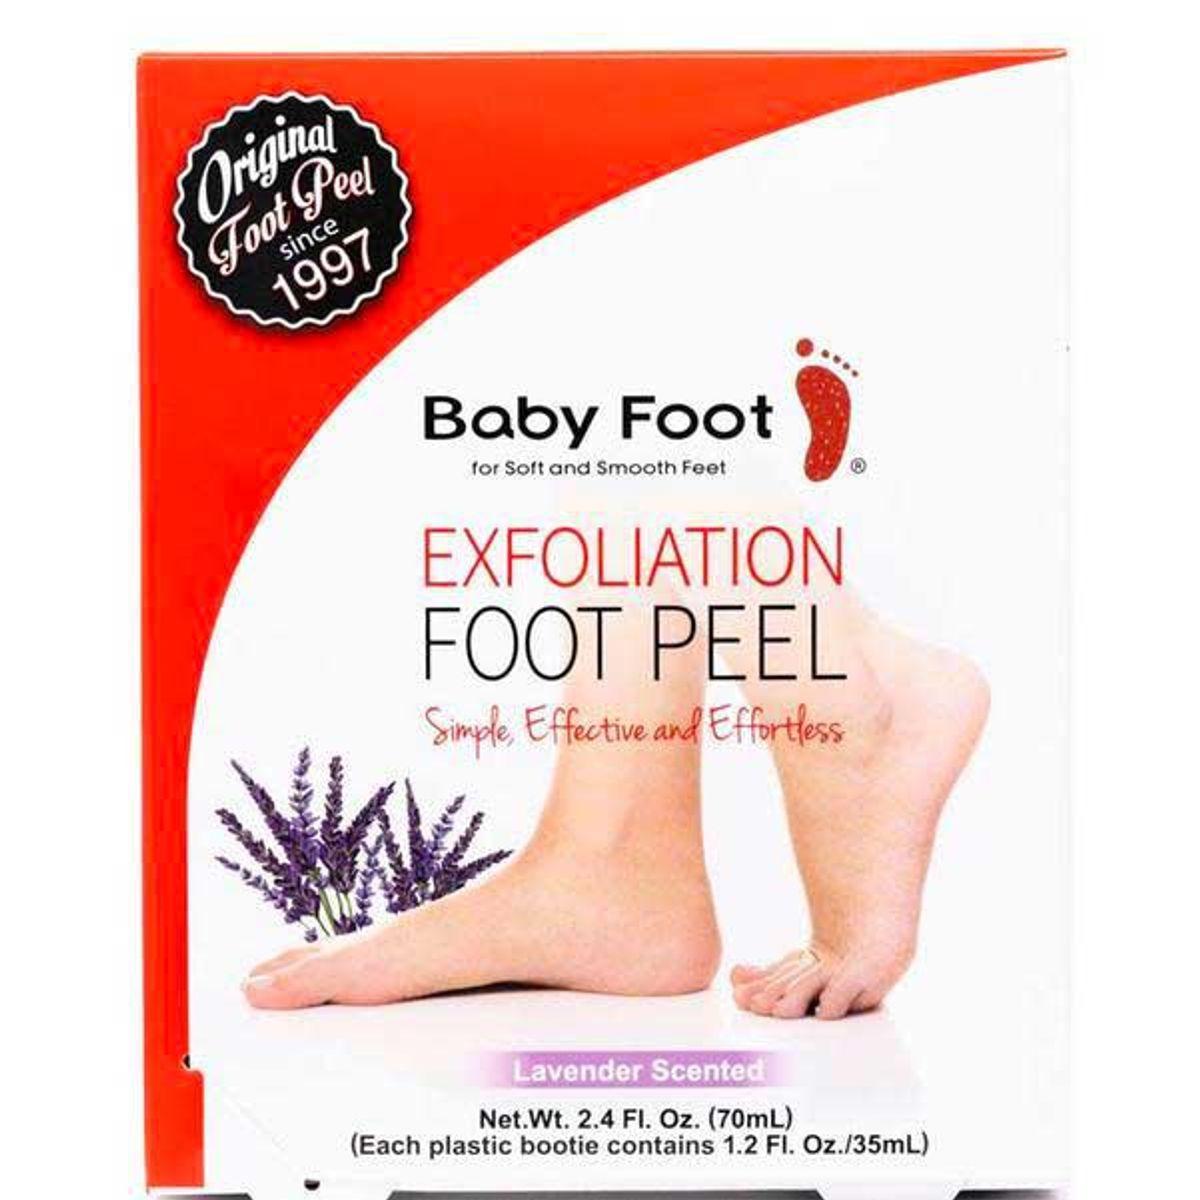 baby foot original exfoliation foot peel